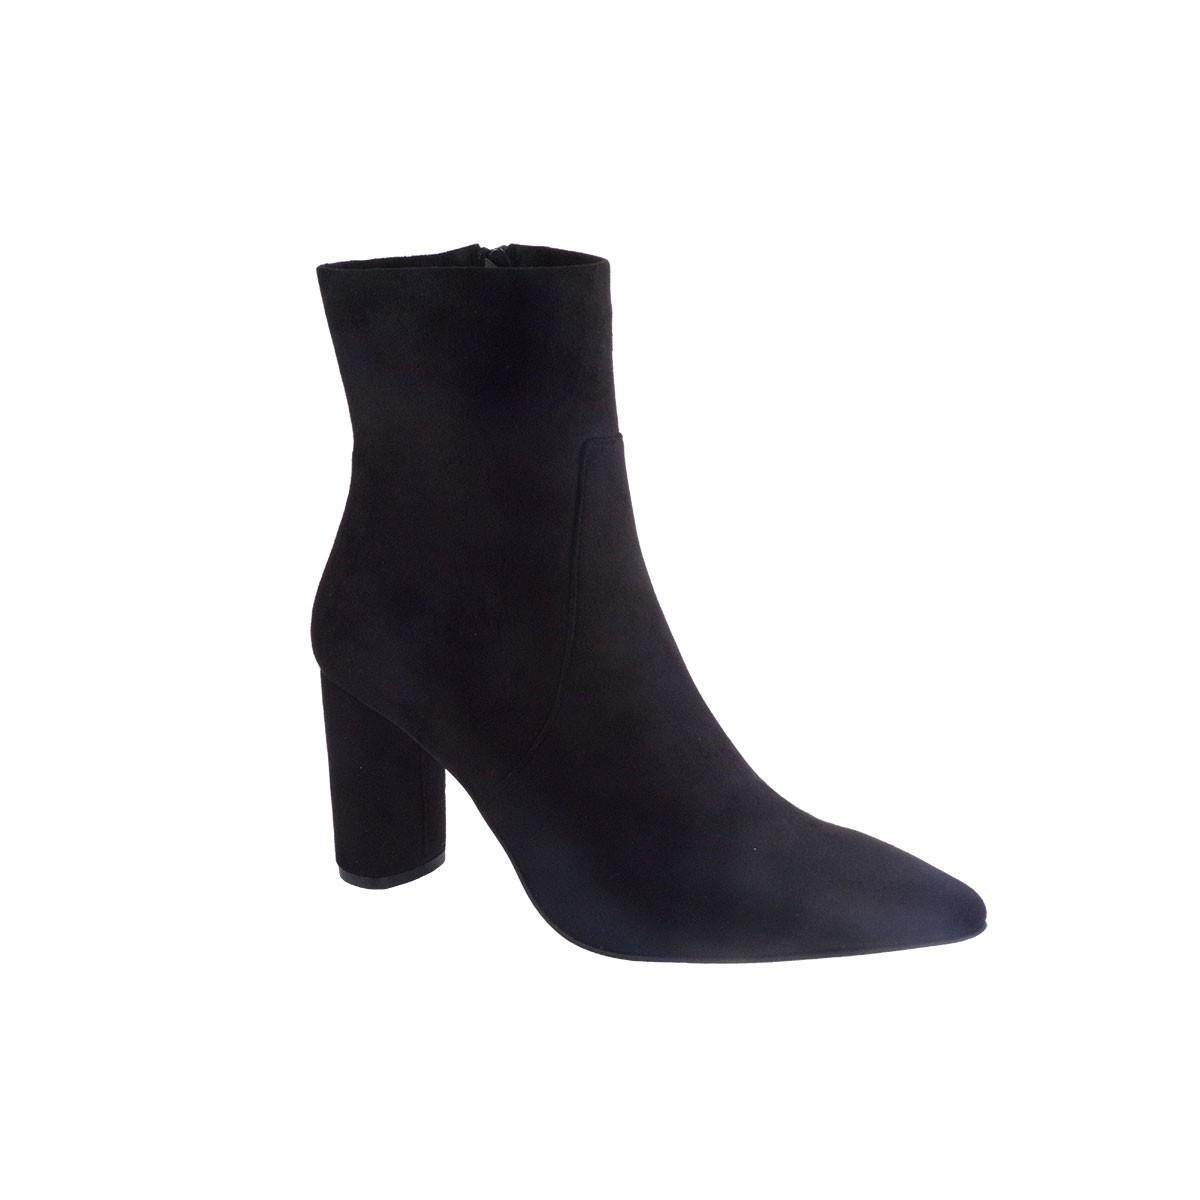 Fardoulis Shoes Γυναικεία Παπούτσια Μποτάκια 4311 Μαύρο Λικρα